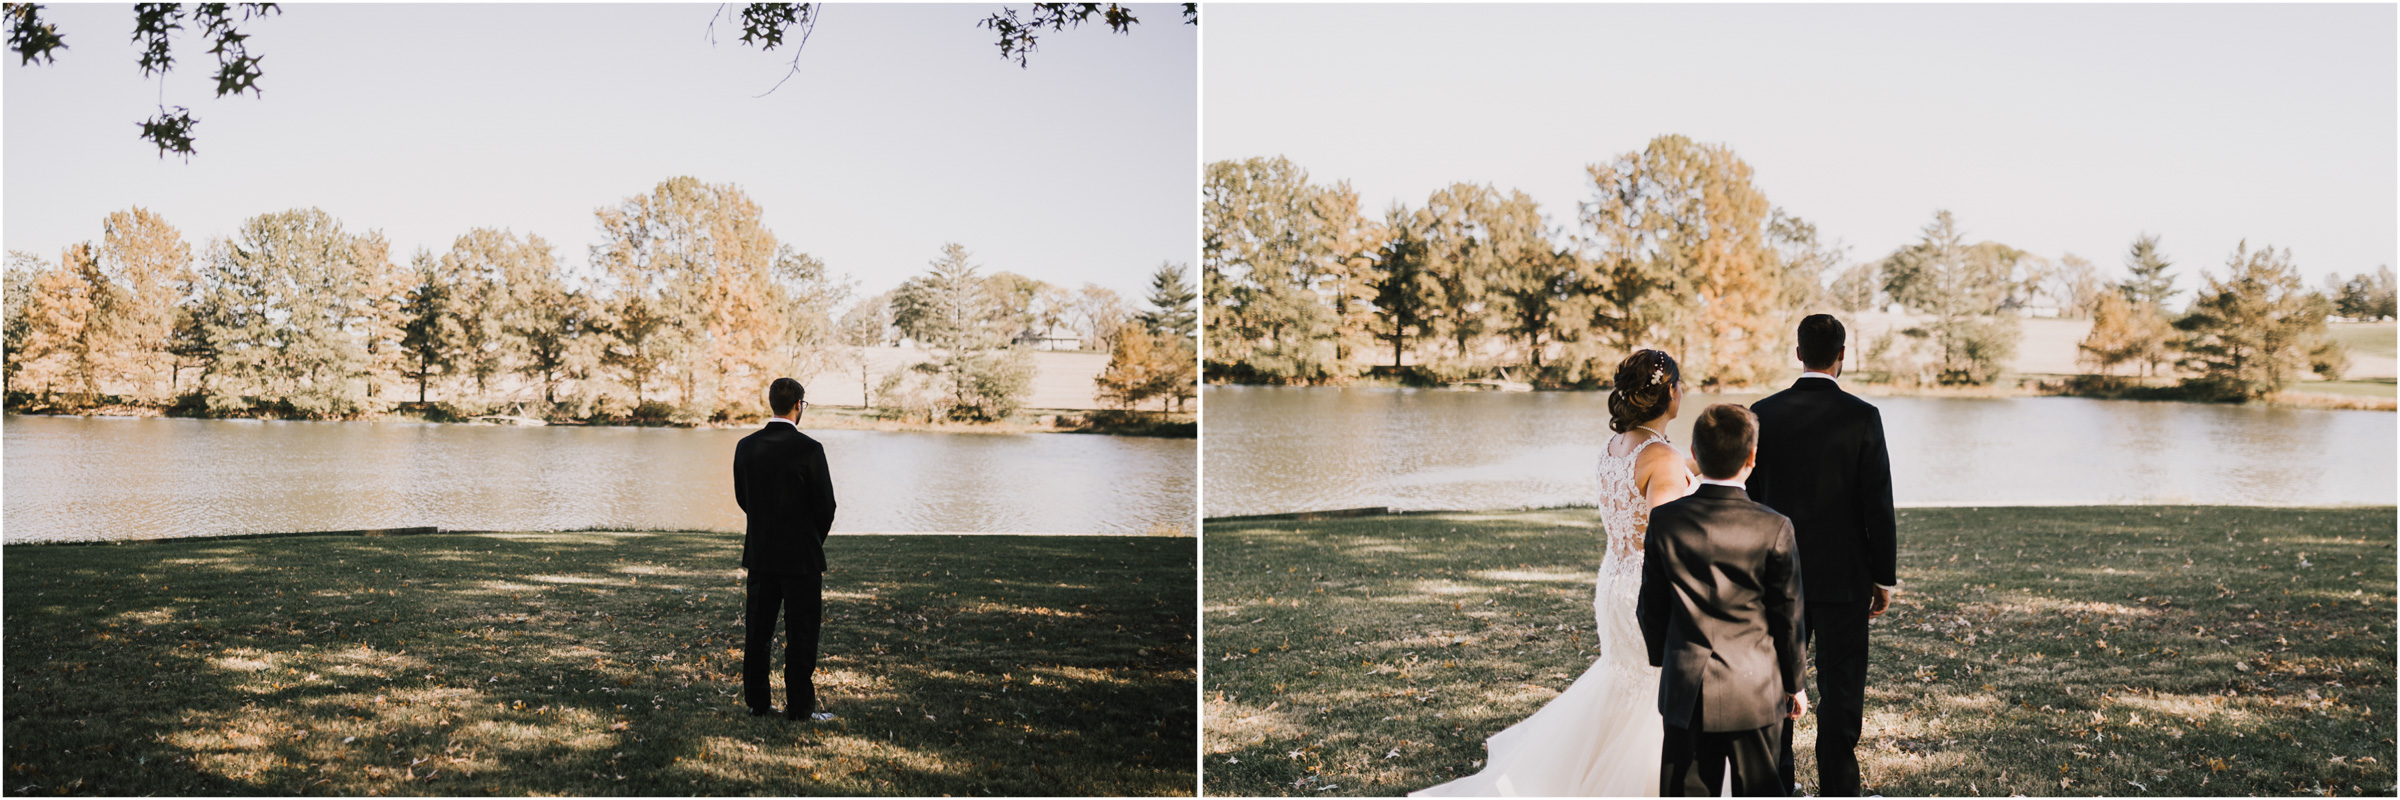 alyssa barletter photography intimate fall autumn wedding rural missouri wedding photographer-5.jpg